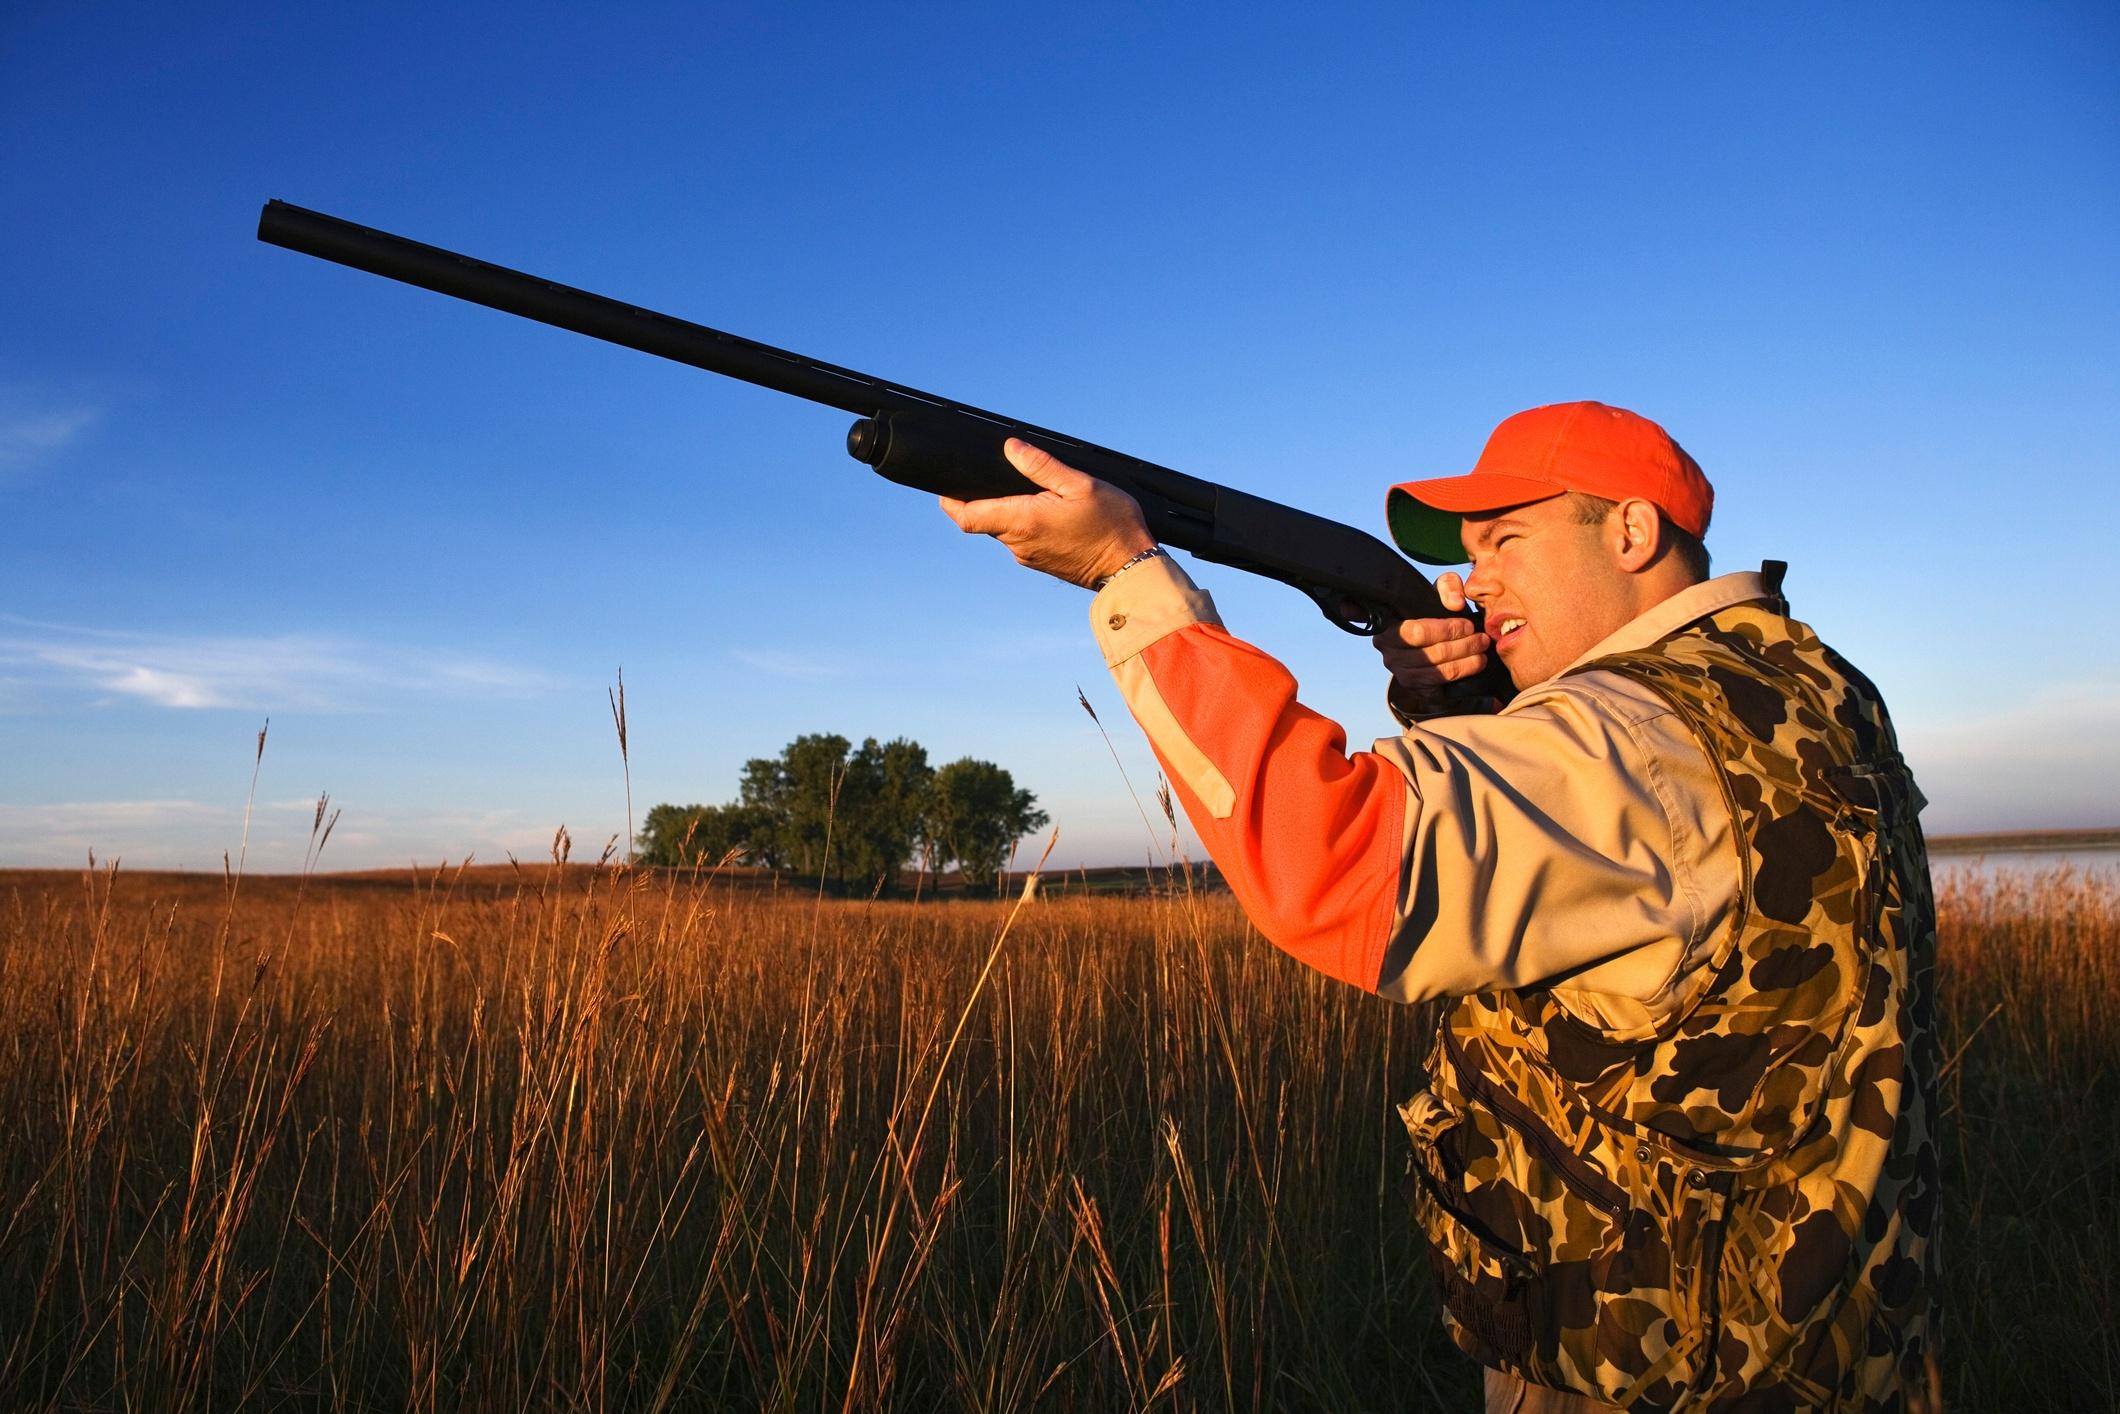 Hunting Season Essentials + Cook Portable Warehouses